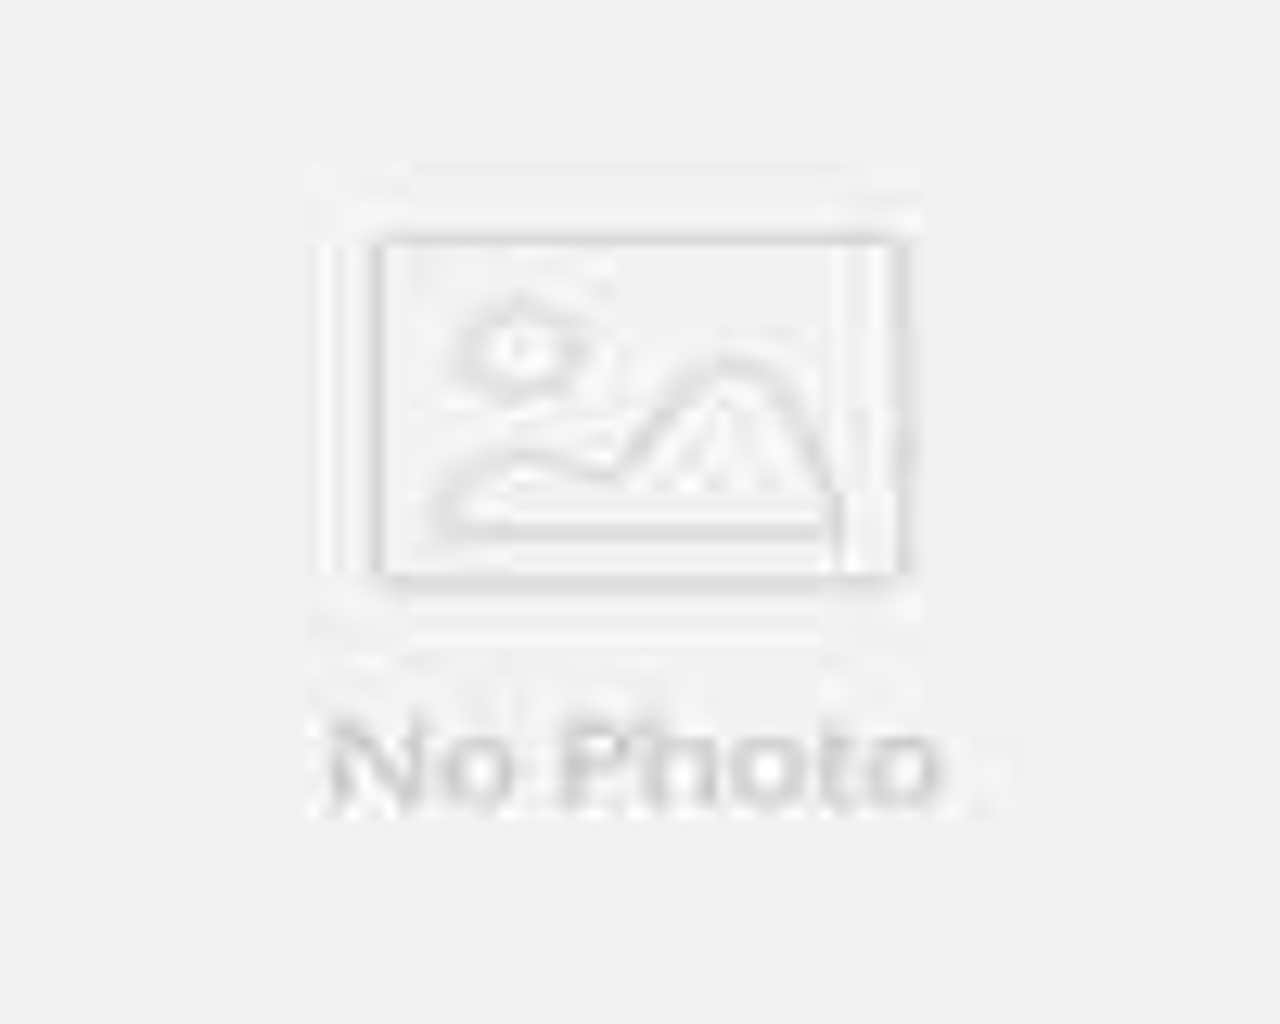 Tv Cabinet Buy Tv FurnitureTv StandWood Tv Cabinets  : TVcabinet from alibaba.com size 1280 x 1024 jpeg 72kB